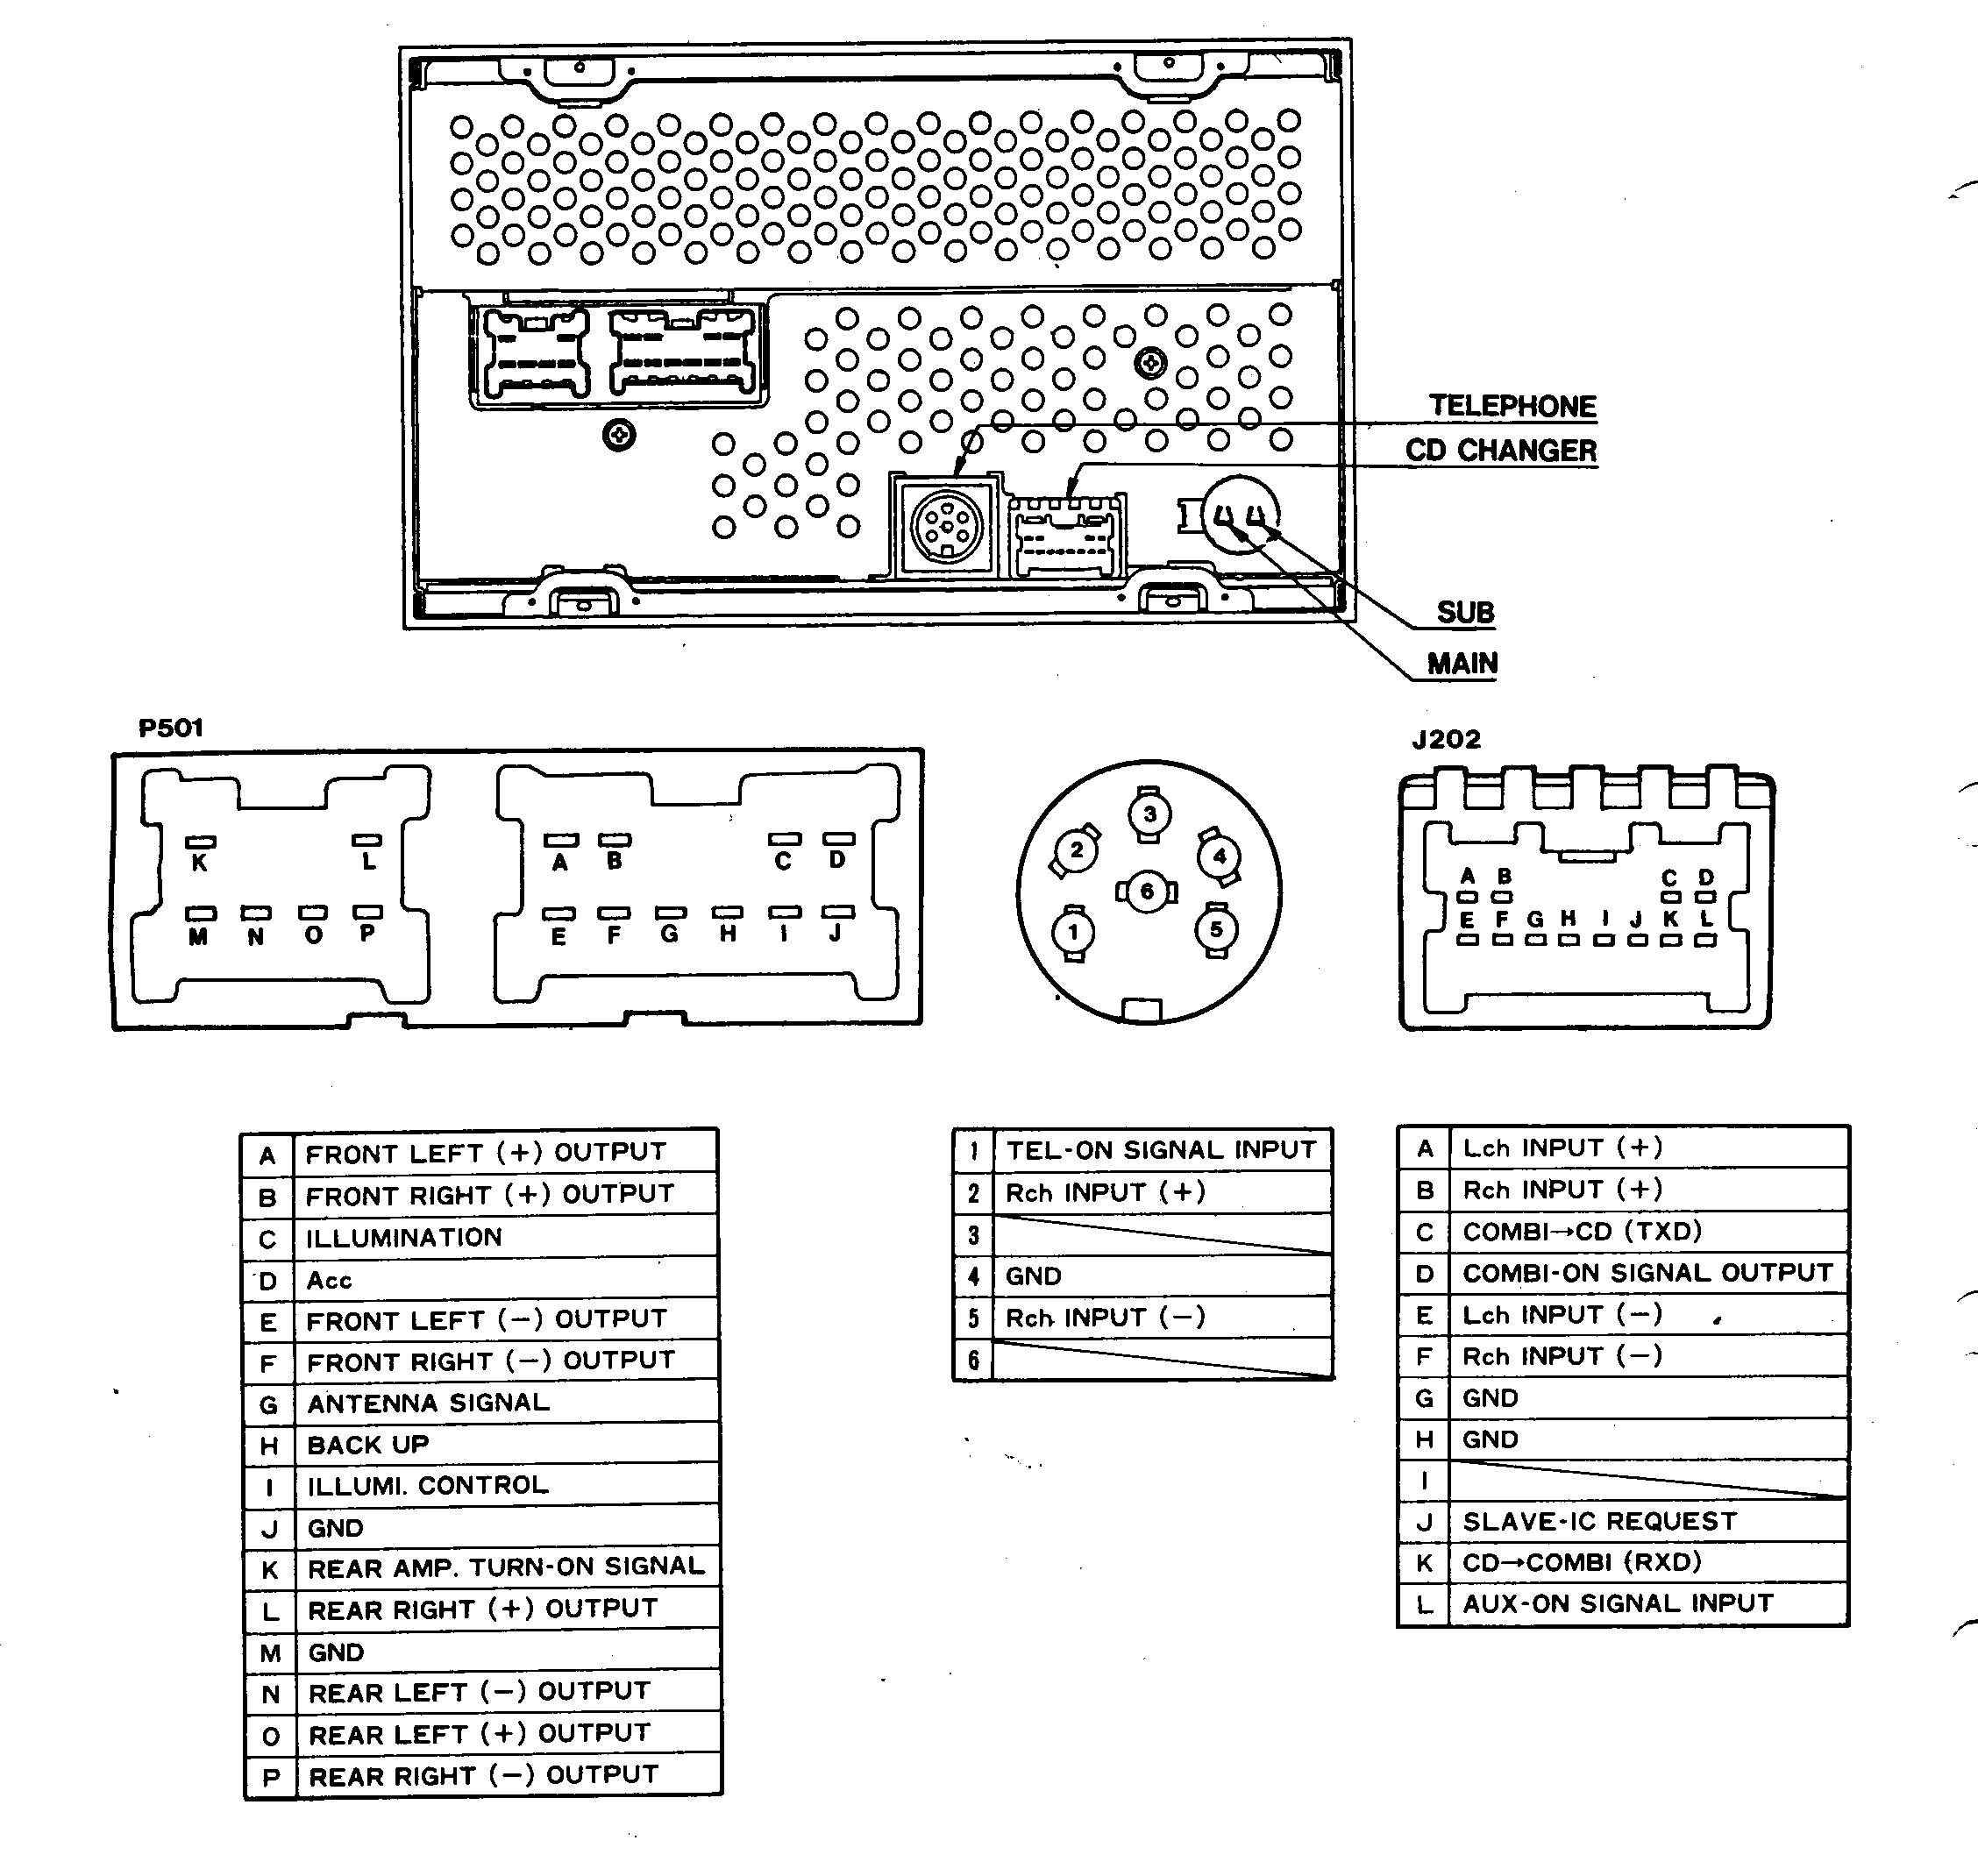 Audio Wiring Diagram Nissan - Wiring Block Diagram - Nissan Wiring Diagram